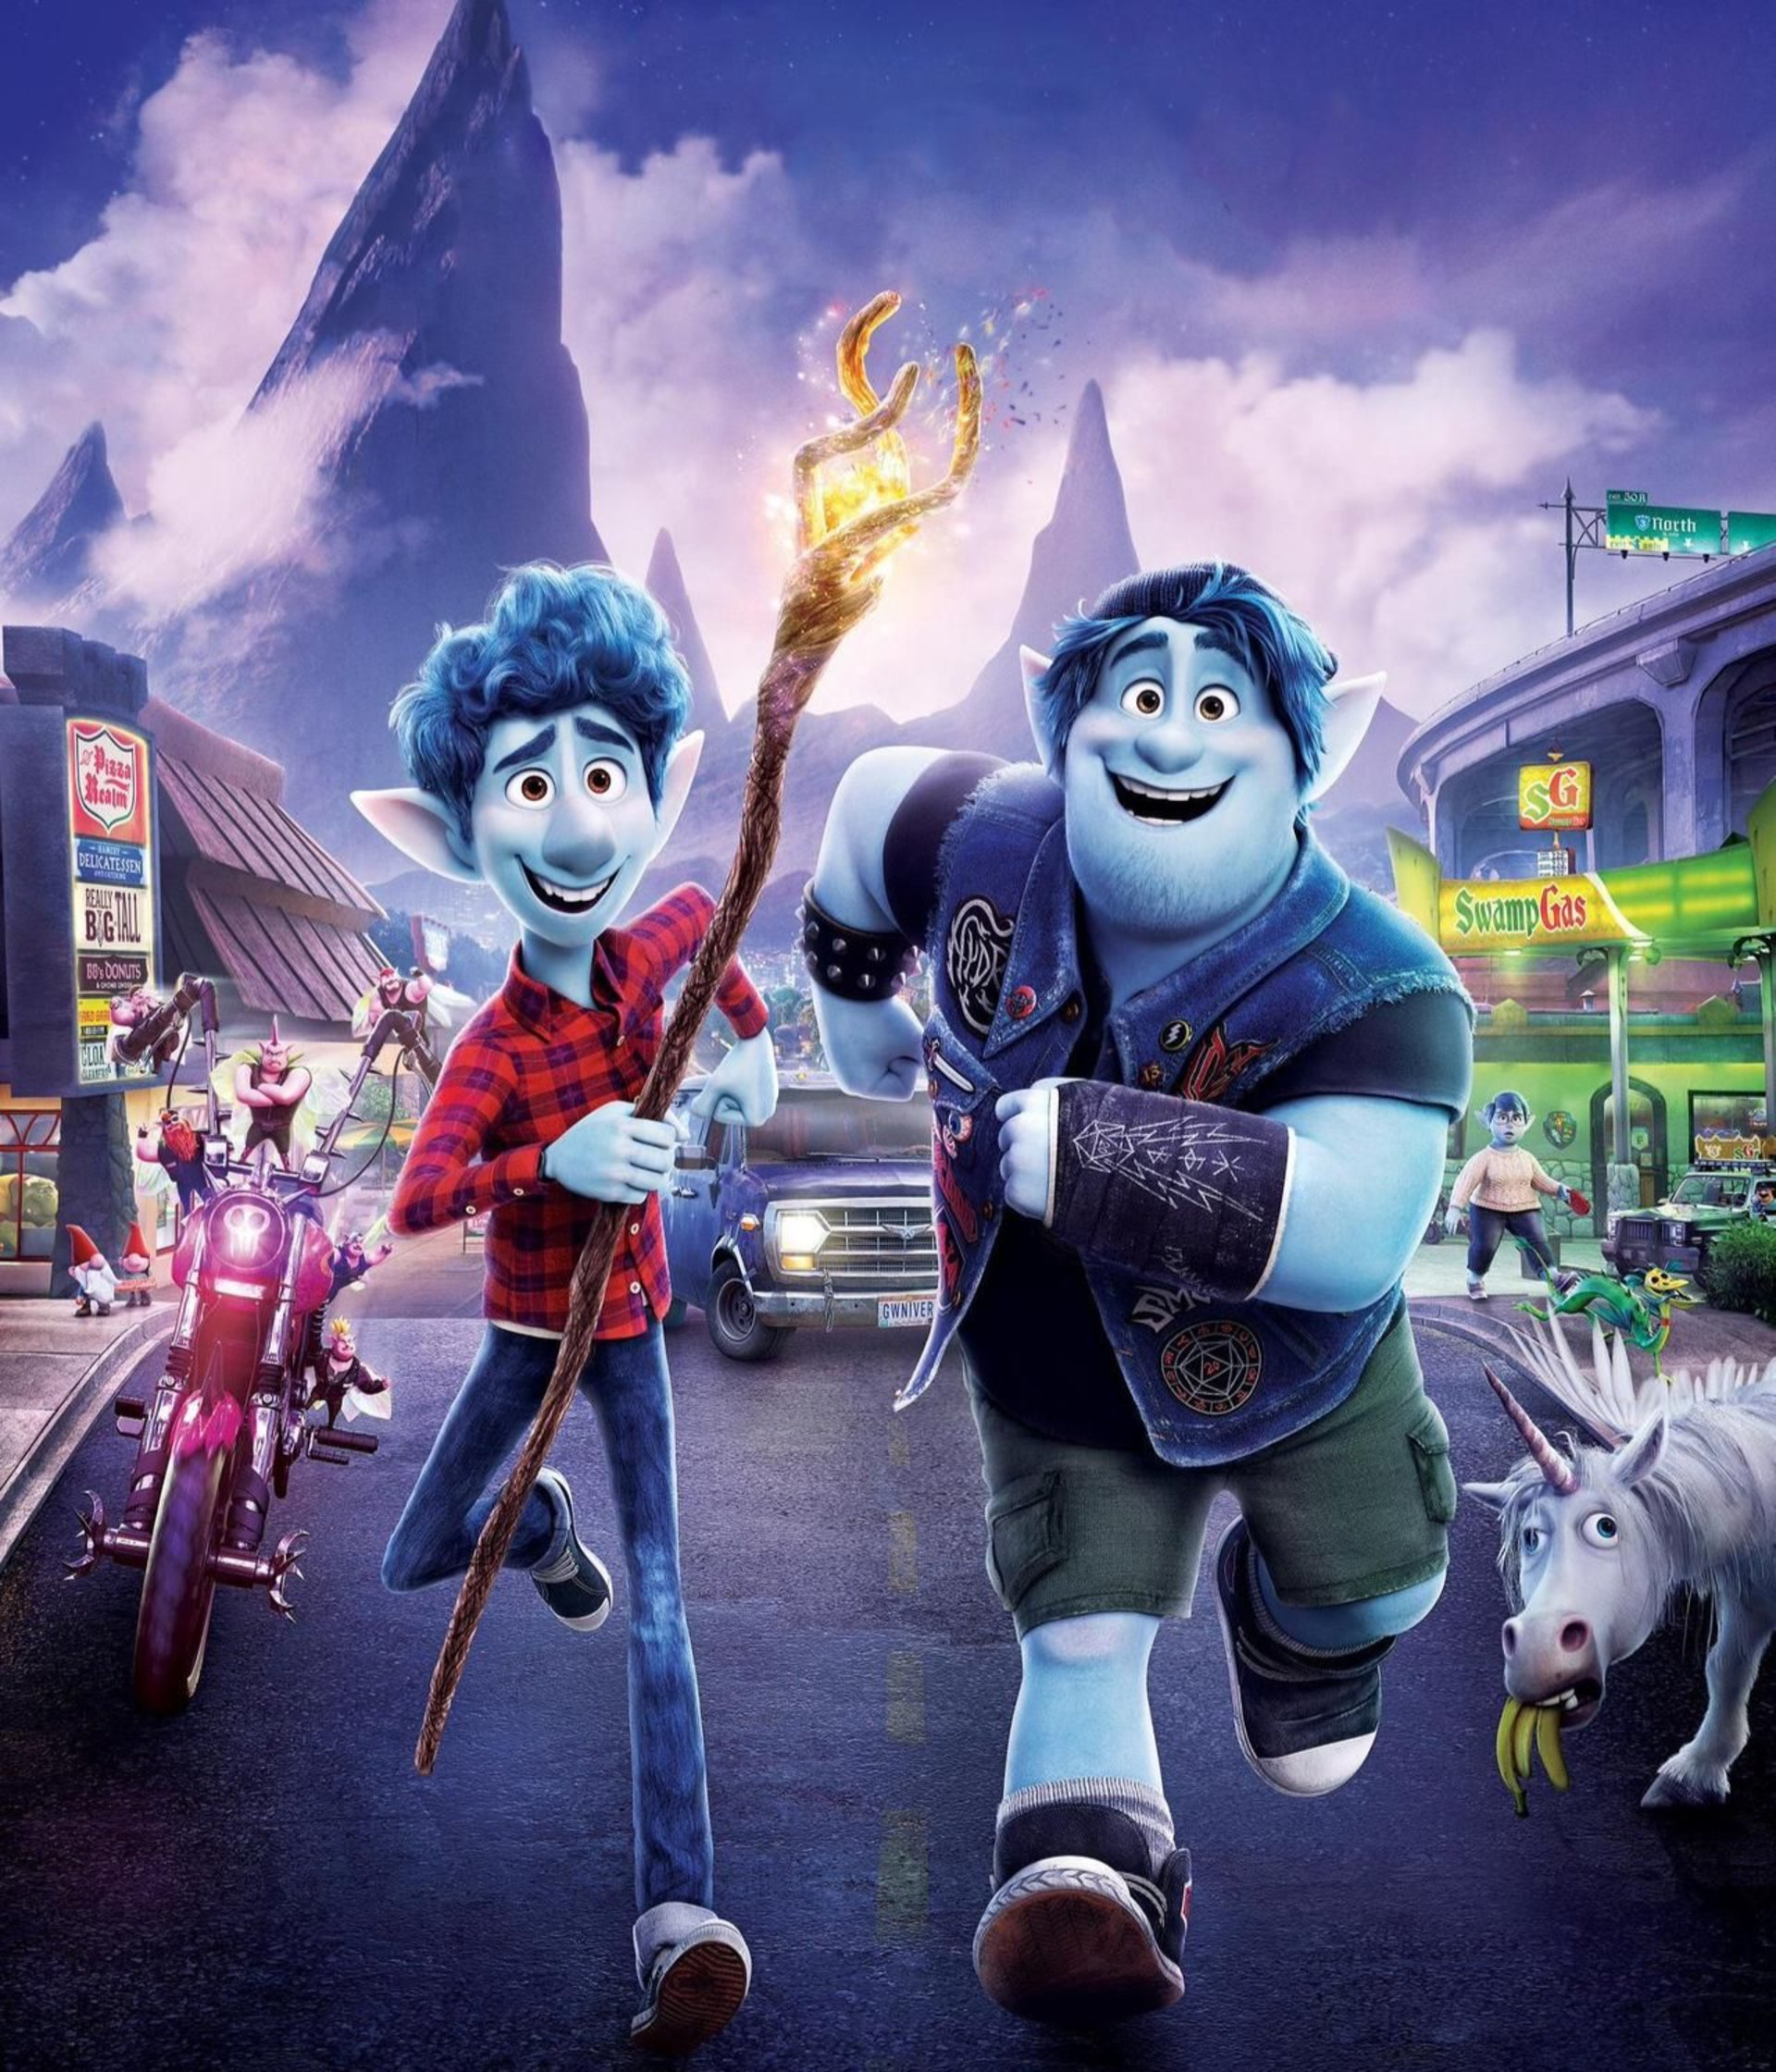 Nonton Film Onward (2020) Subtitle Indonesia | Nonton Film ...